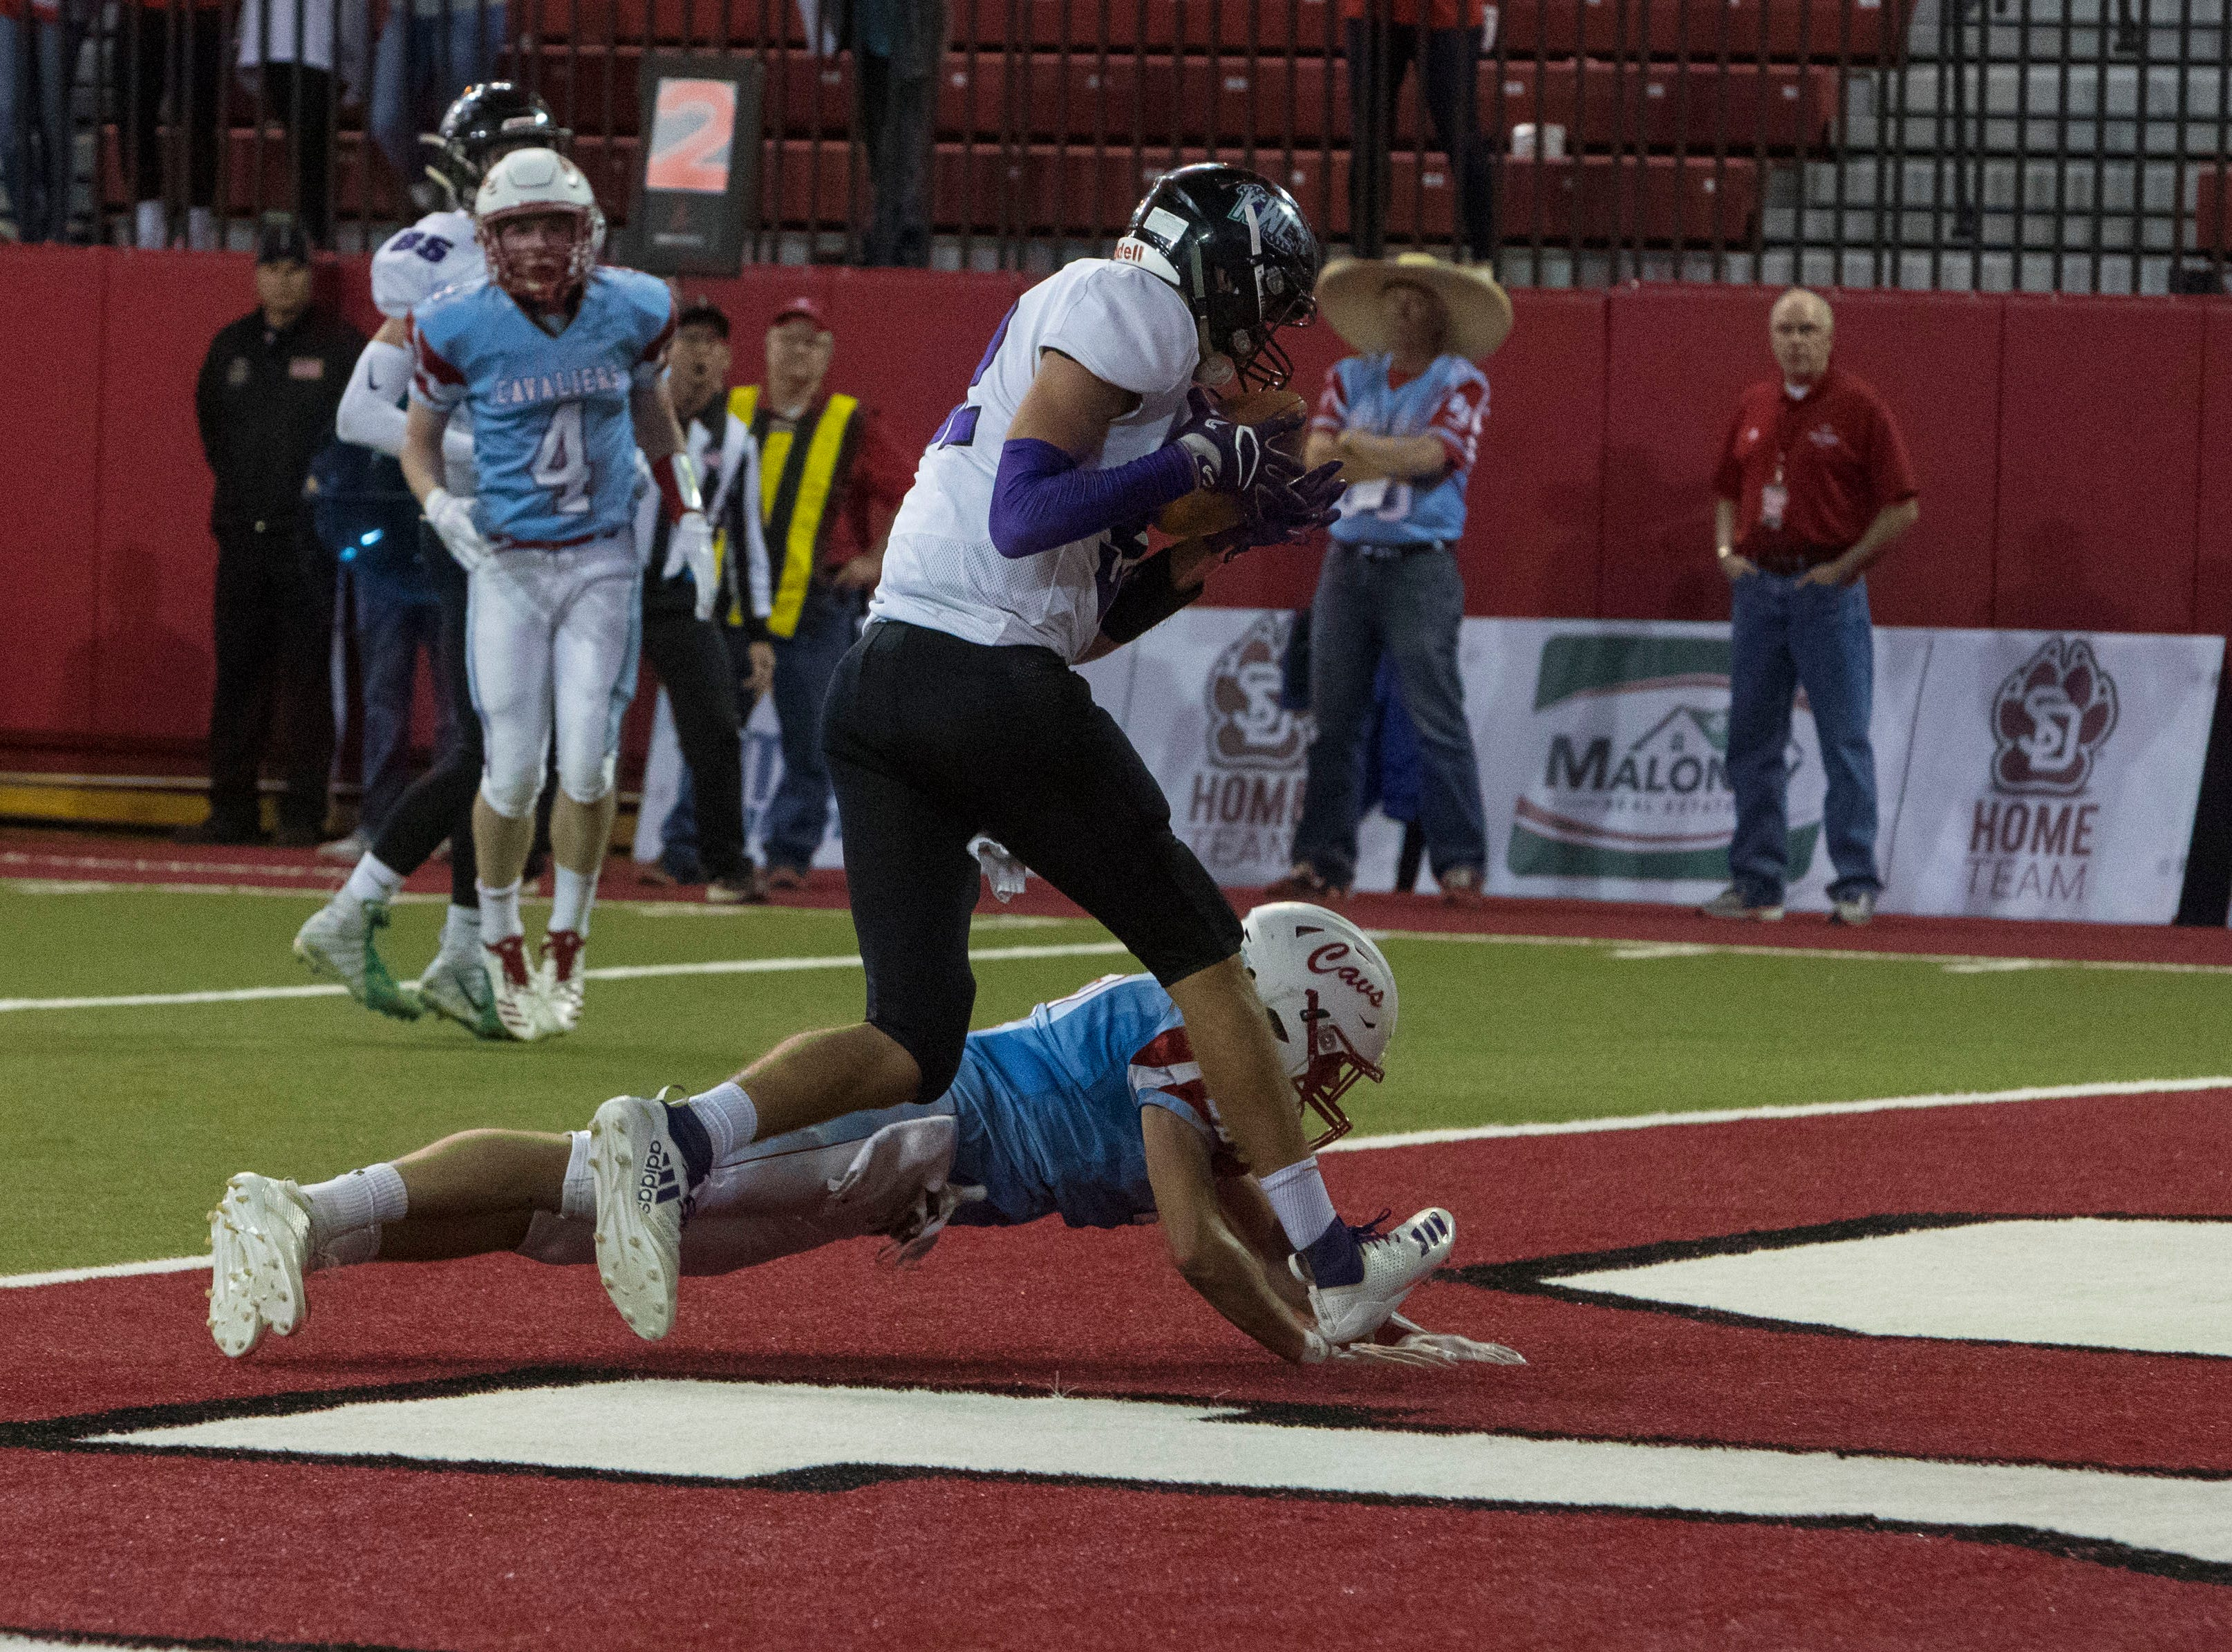 Kimball/White Lake's scores a touchdownduring a game against Bon Homme, Thursday, Nov. 8, 2018 at the DakotaDome in Vermillion, S.D.